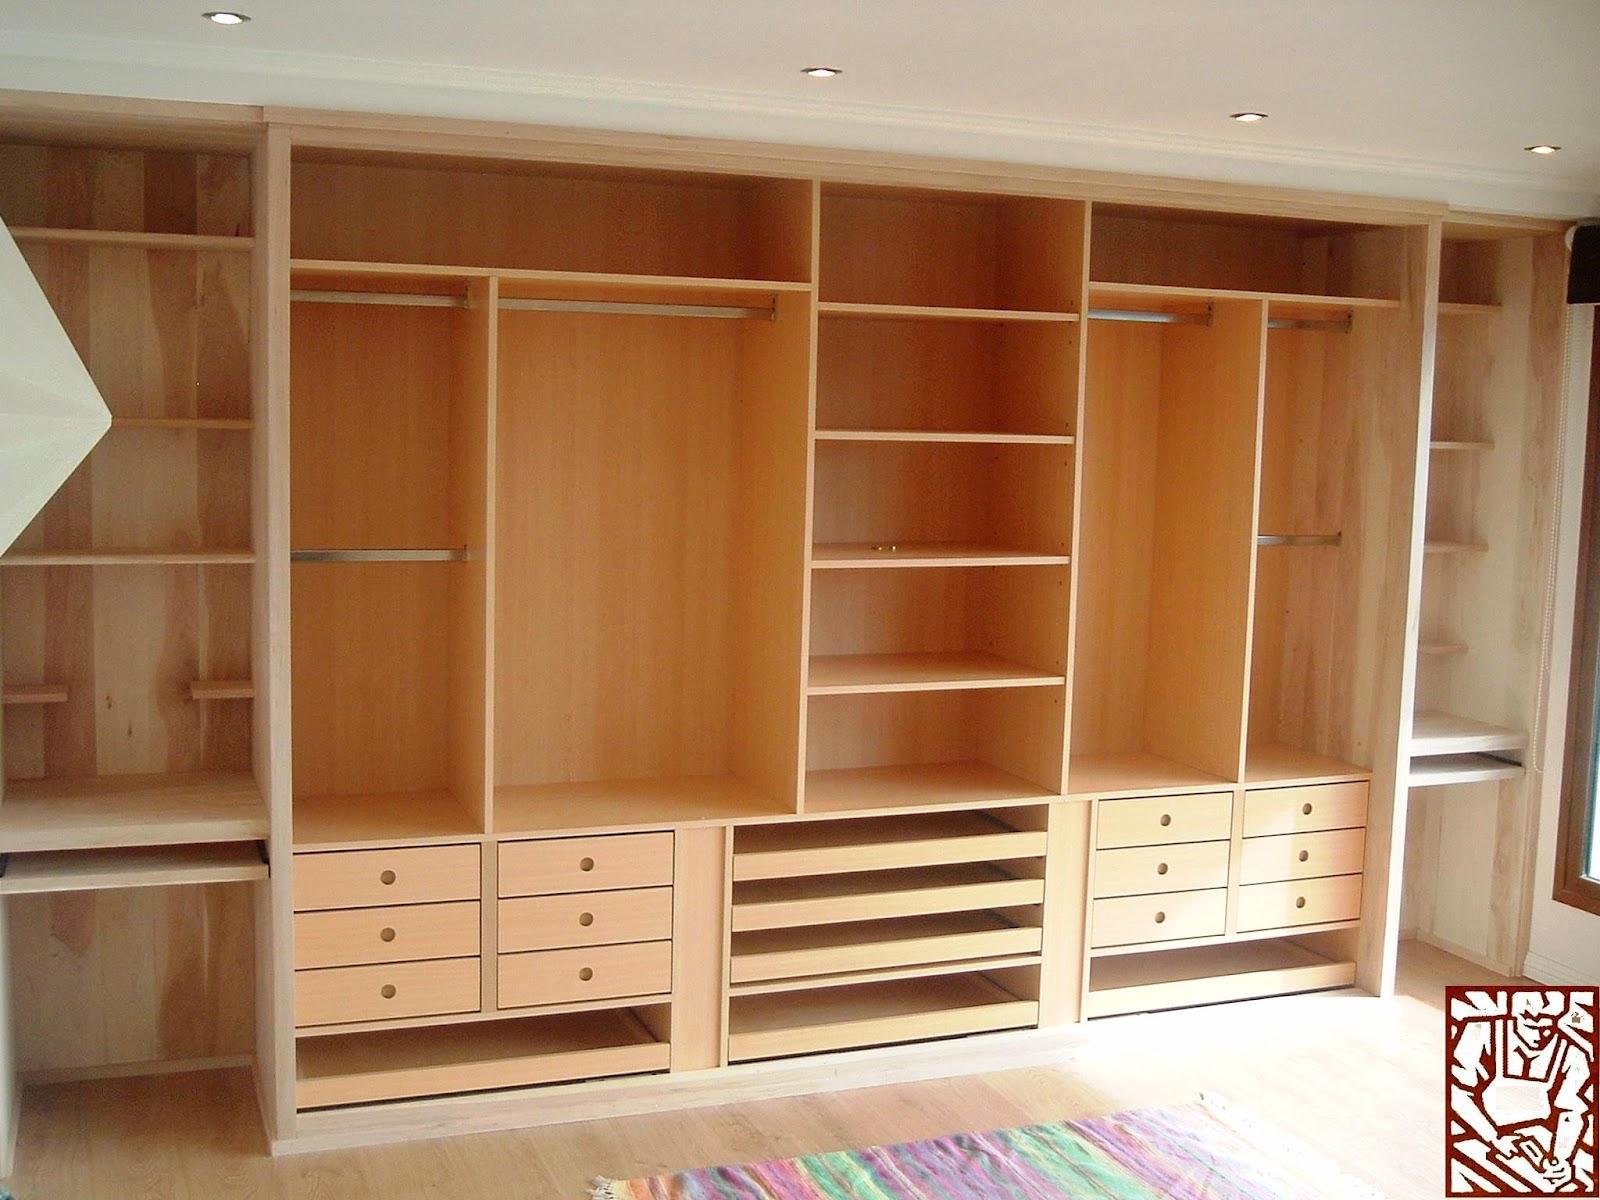 Carpinteriaparaver vestidores y placares for Placares cocina